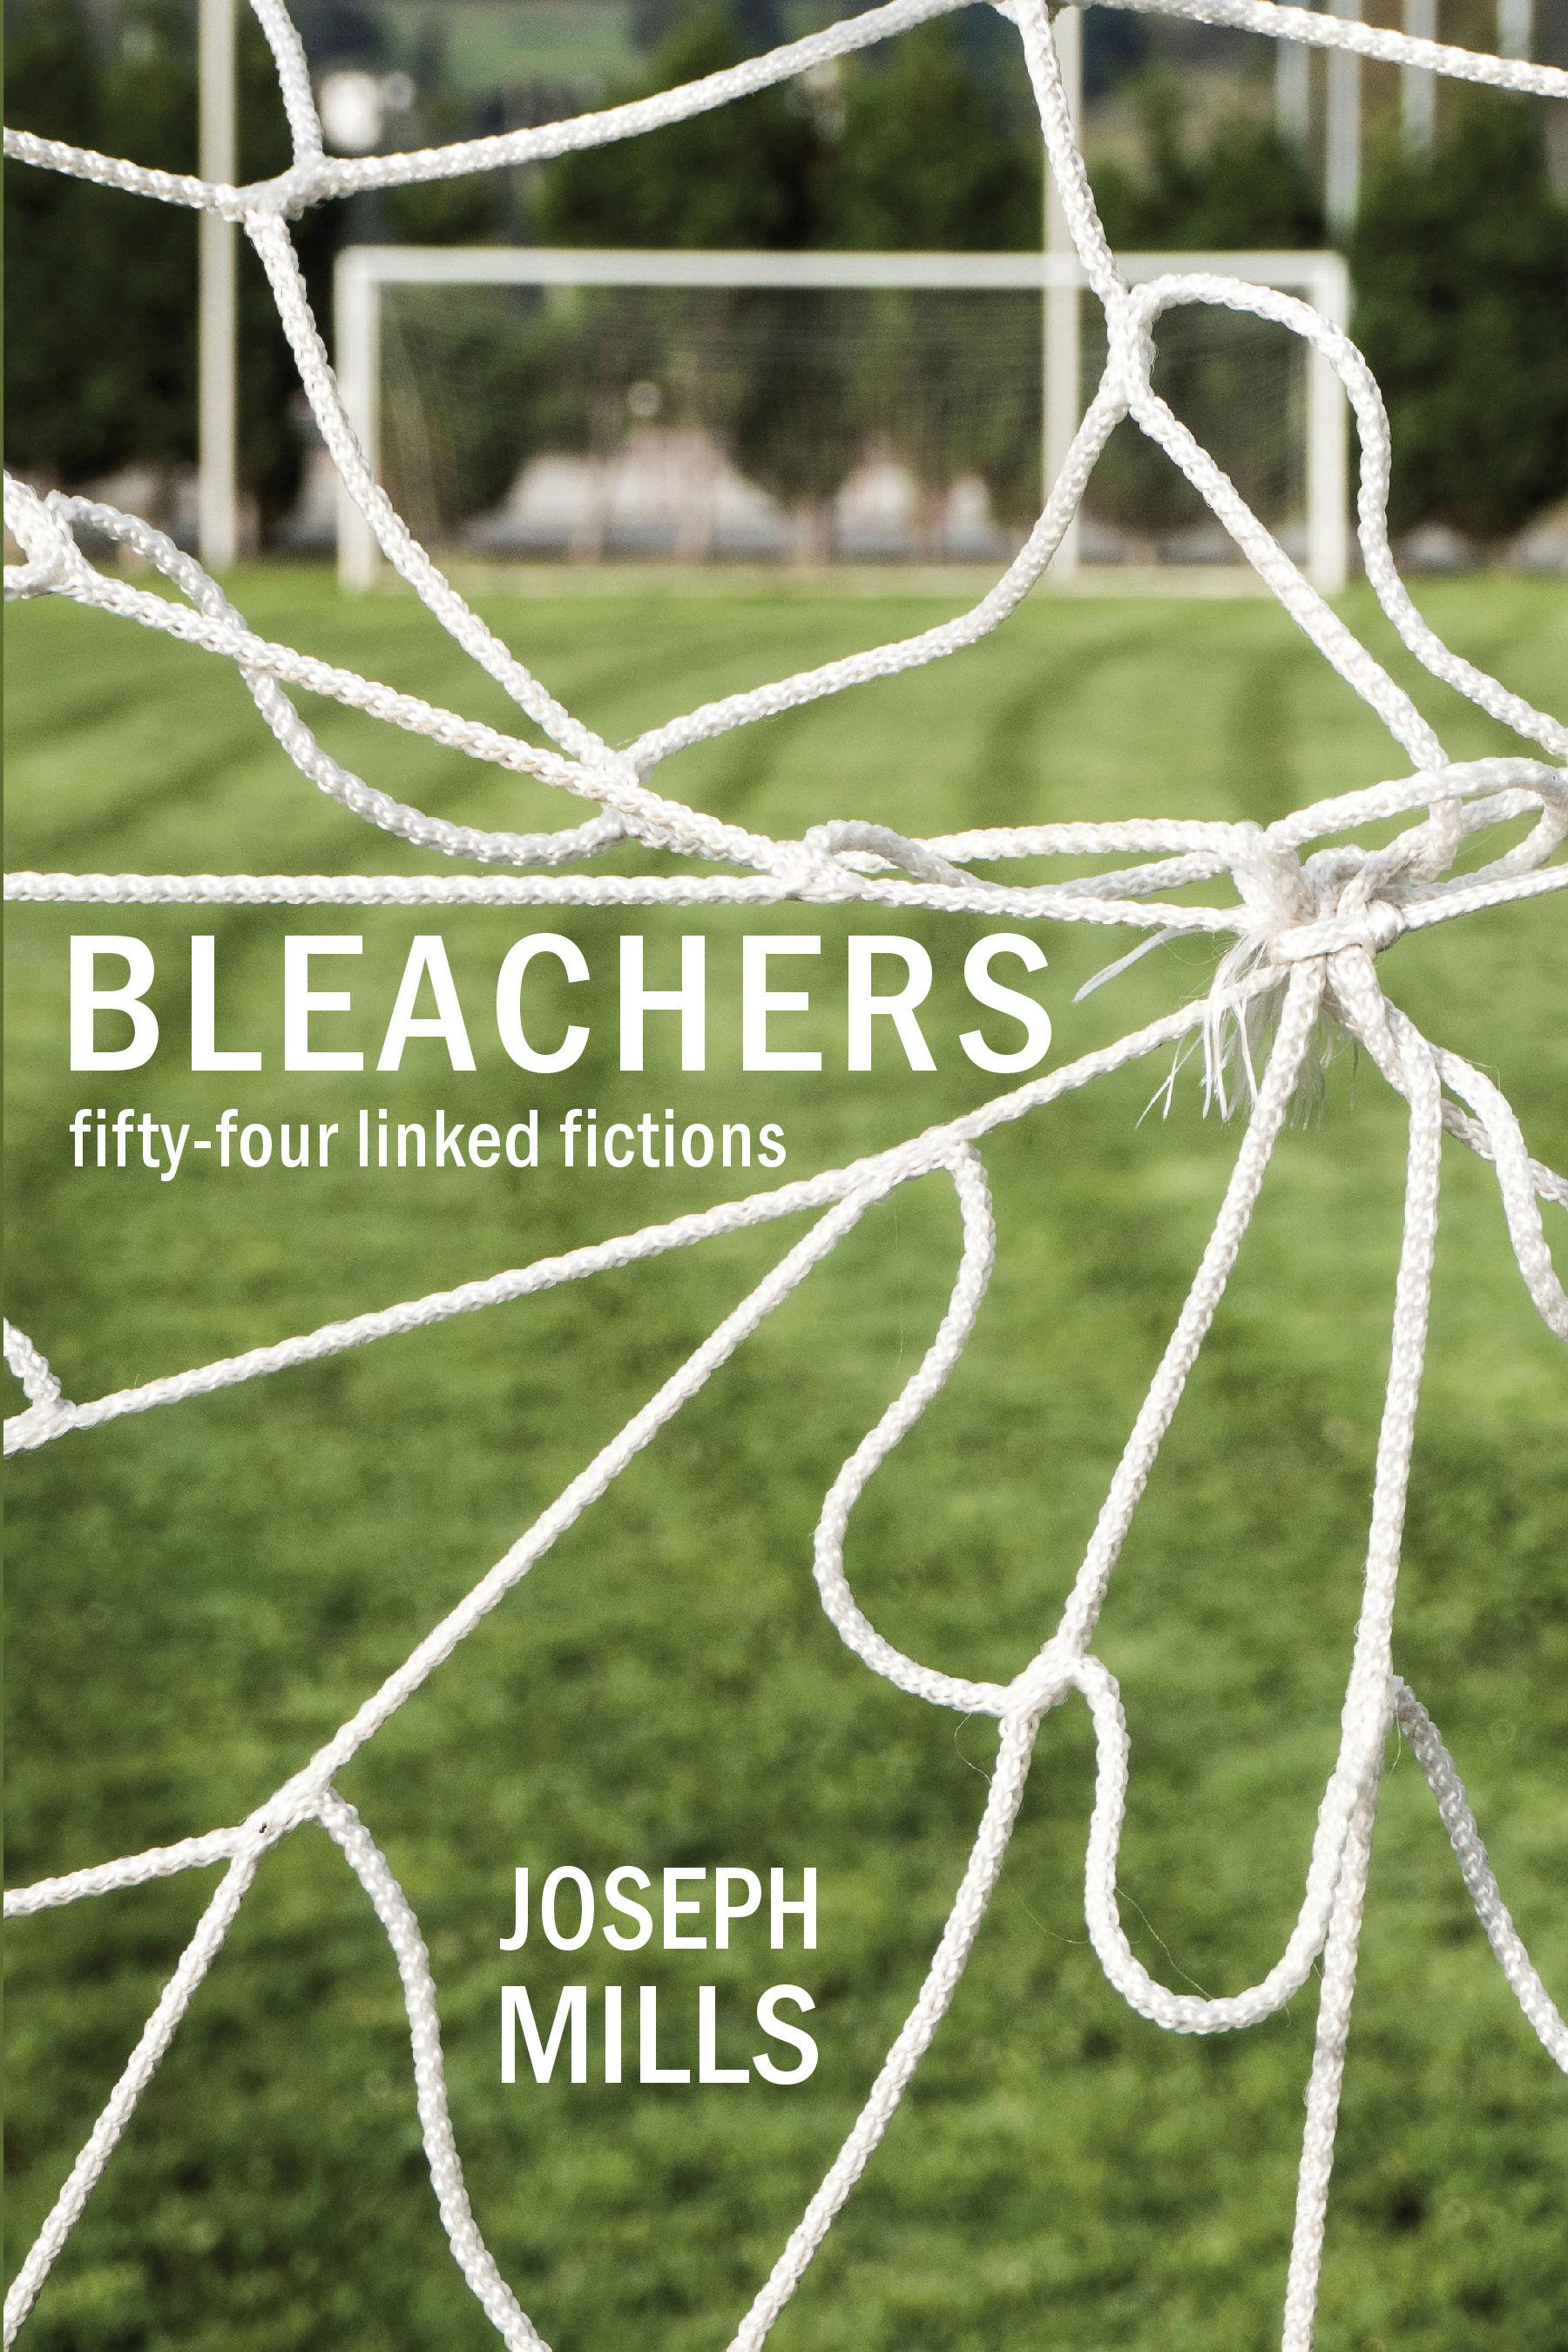 Bleachers by Joseph Mills.jpg